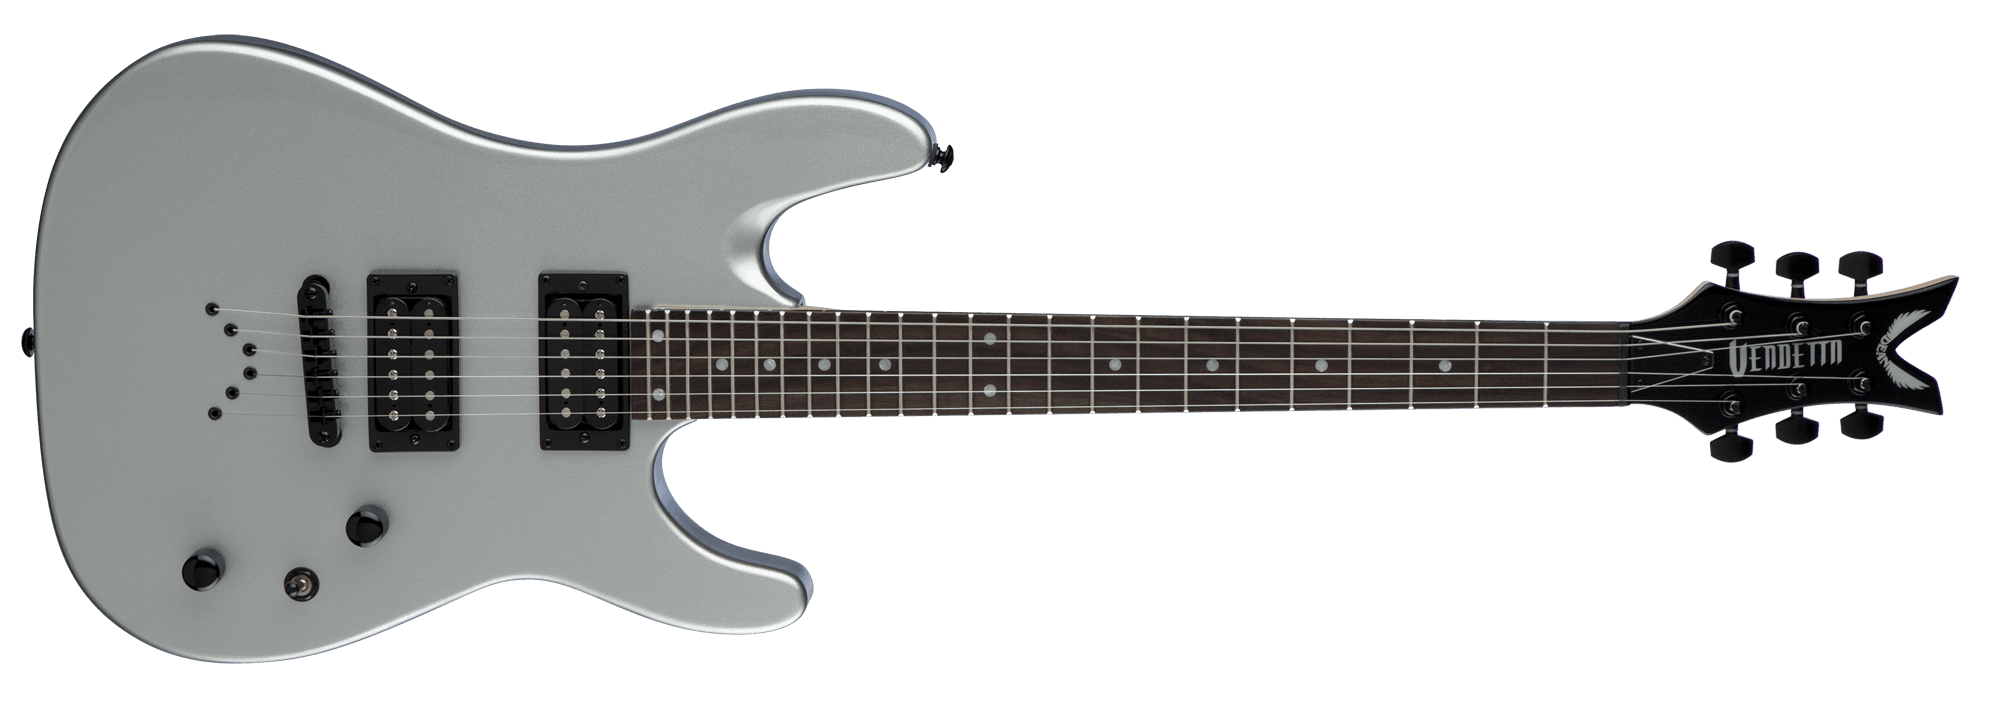 Guitarra Dean Vendetta Xm Metallic Silver